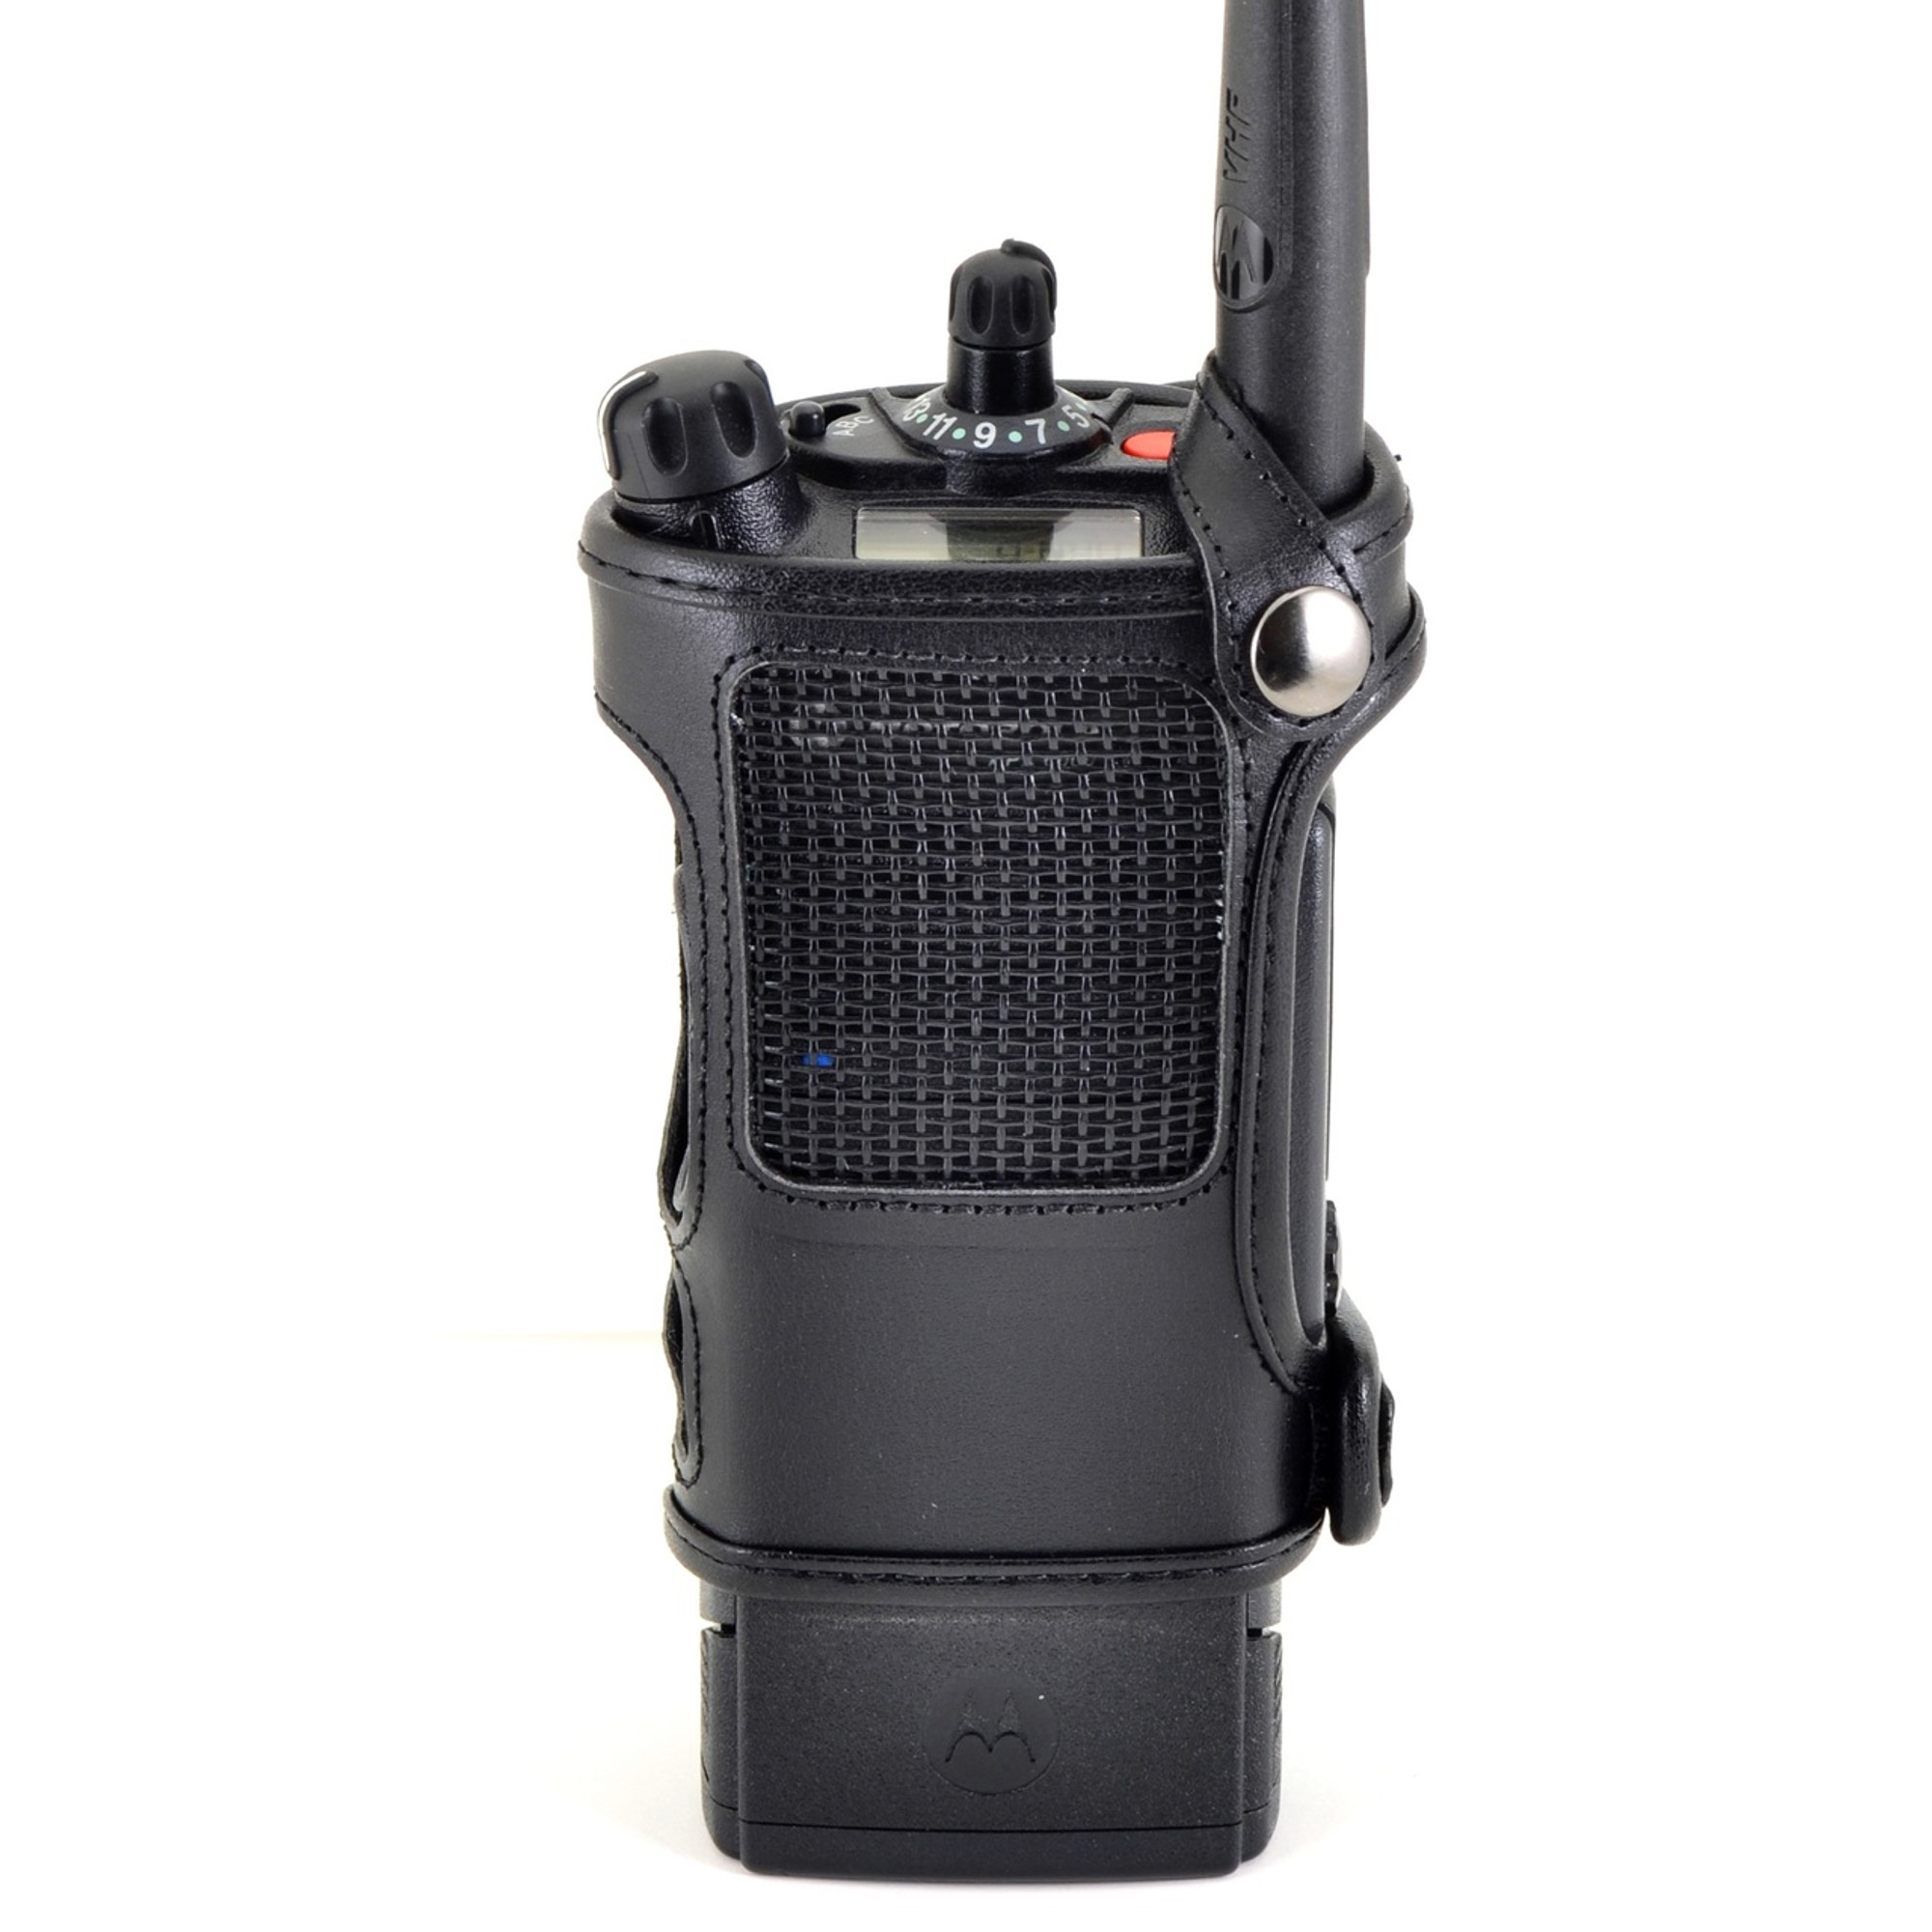 Radio holder motorola apx 6000 - Motorola Apx 8000 Belt Carry Holder Case By Turtleback Black Leather Duty Belt Holster With Heavy Duty